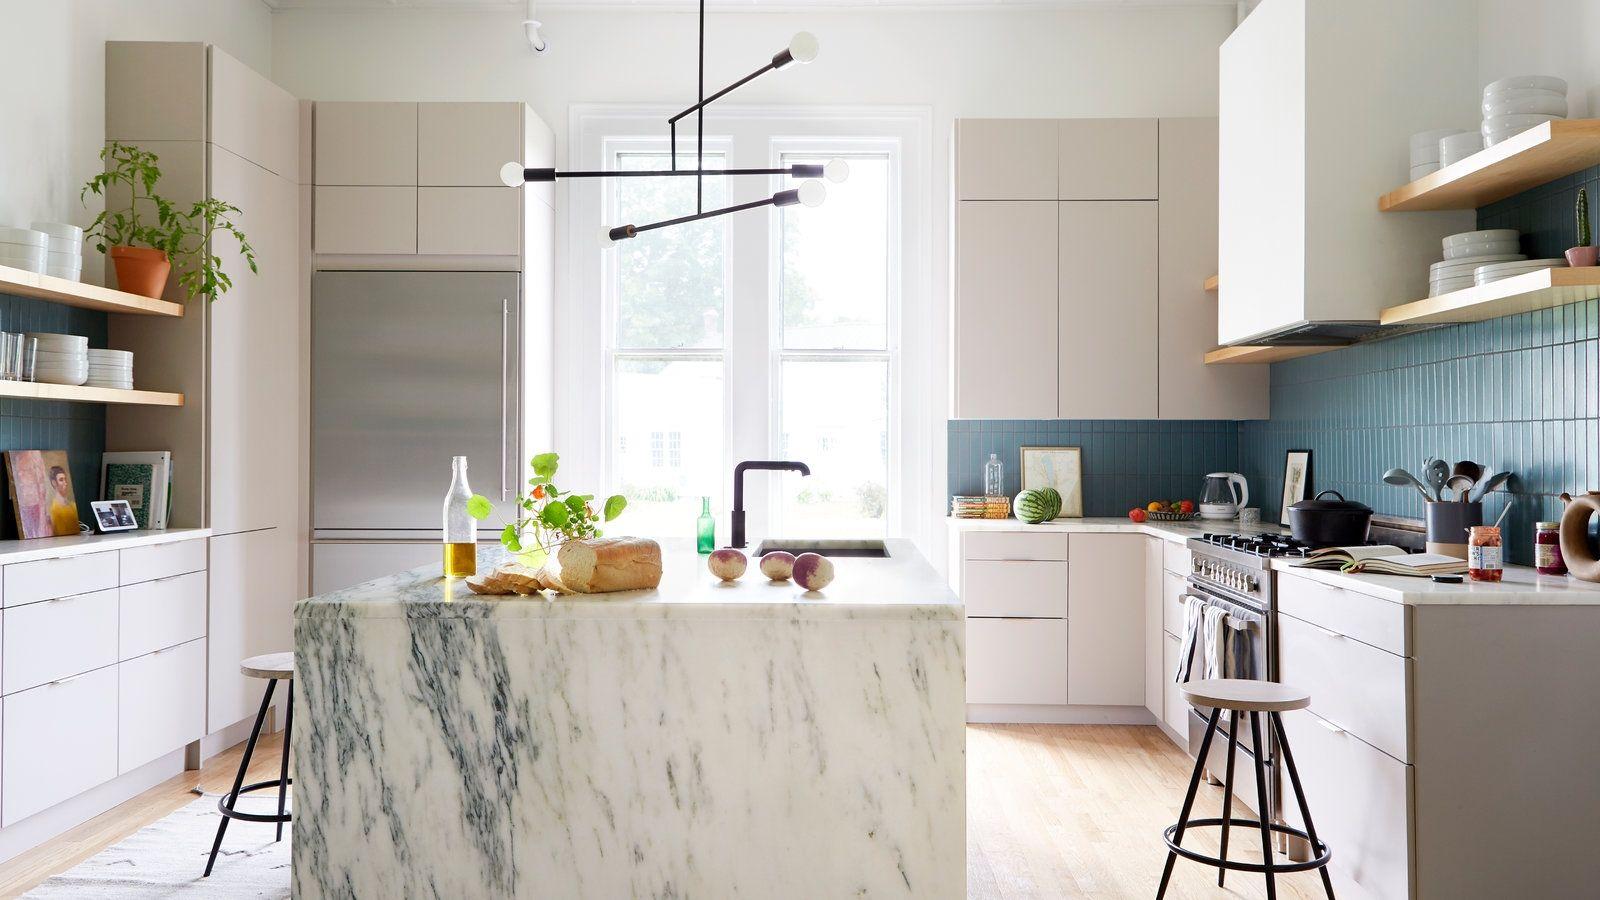 No Budget For A Custom Kitchen No Problem The New York Times In 2020 Kitchen Inspiration Design Kitchen Remodel Custom Kitchen